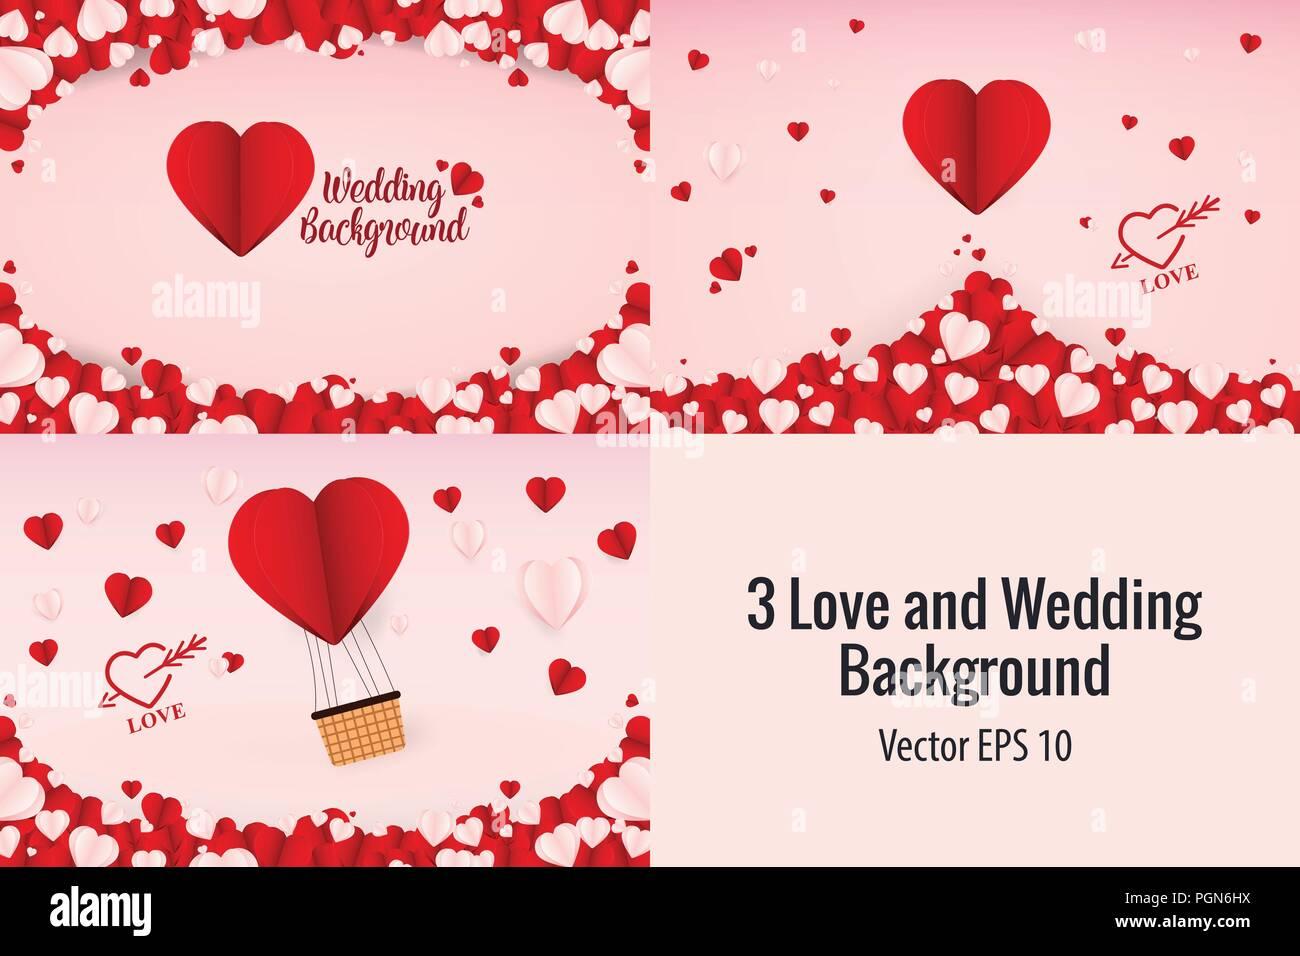 Wedding Vector Vectors Stock Photos & Wedding Vector Vectors Stock ...